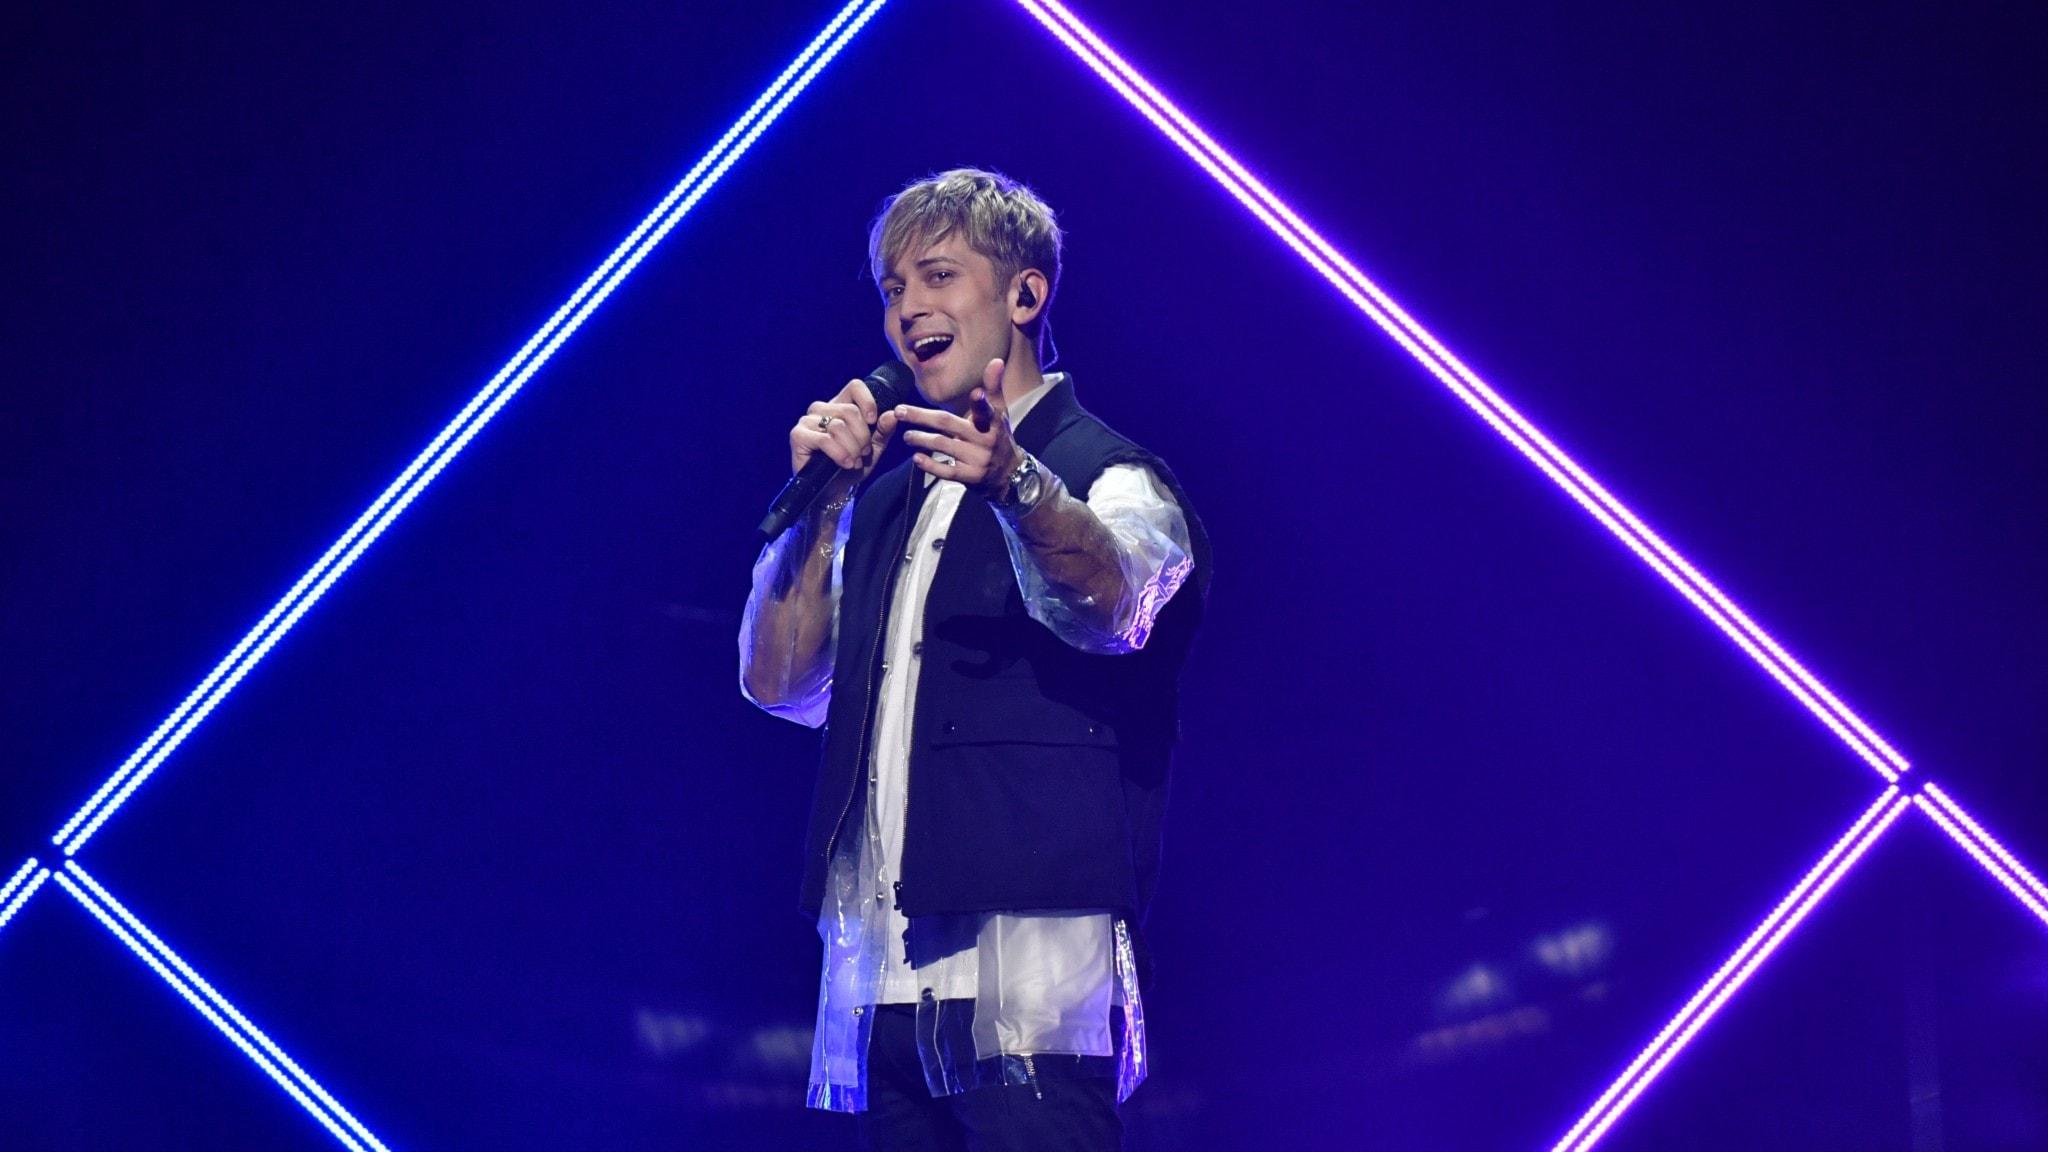 Vlad Reiser i Melodifestivalen